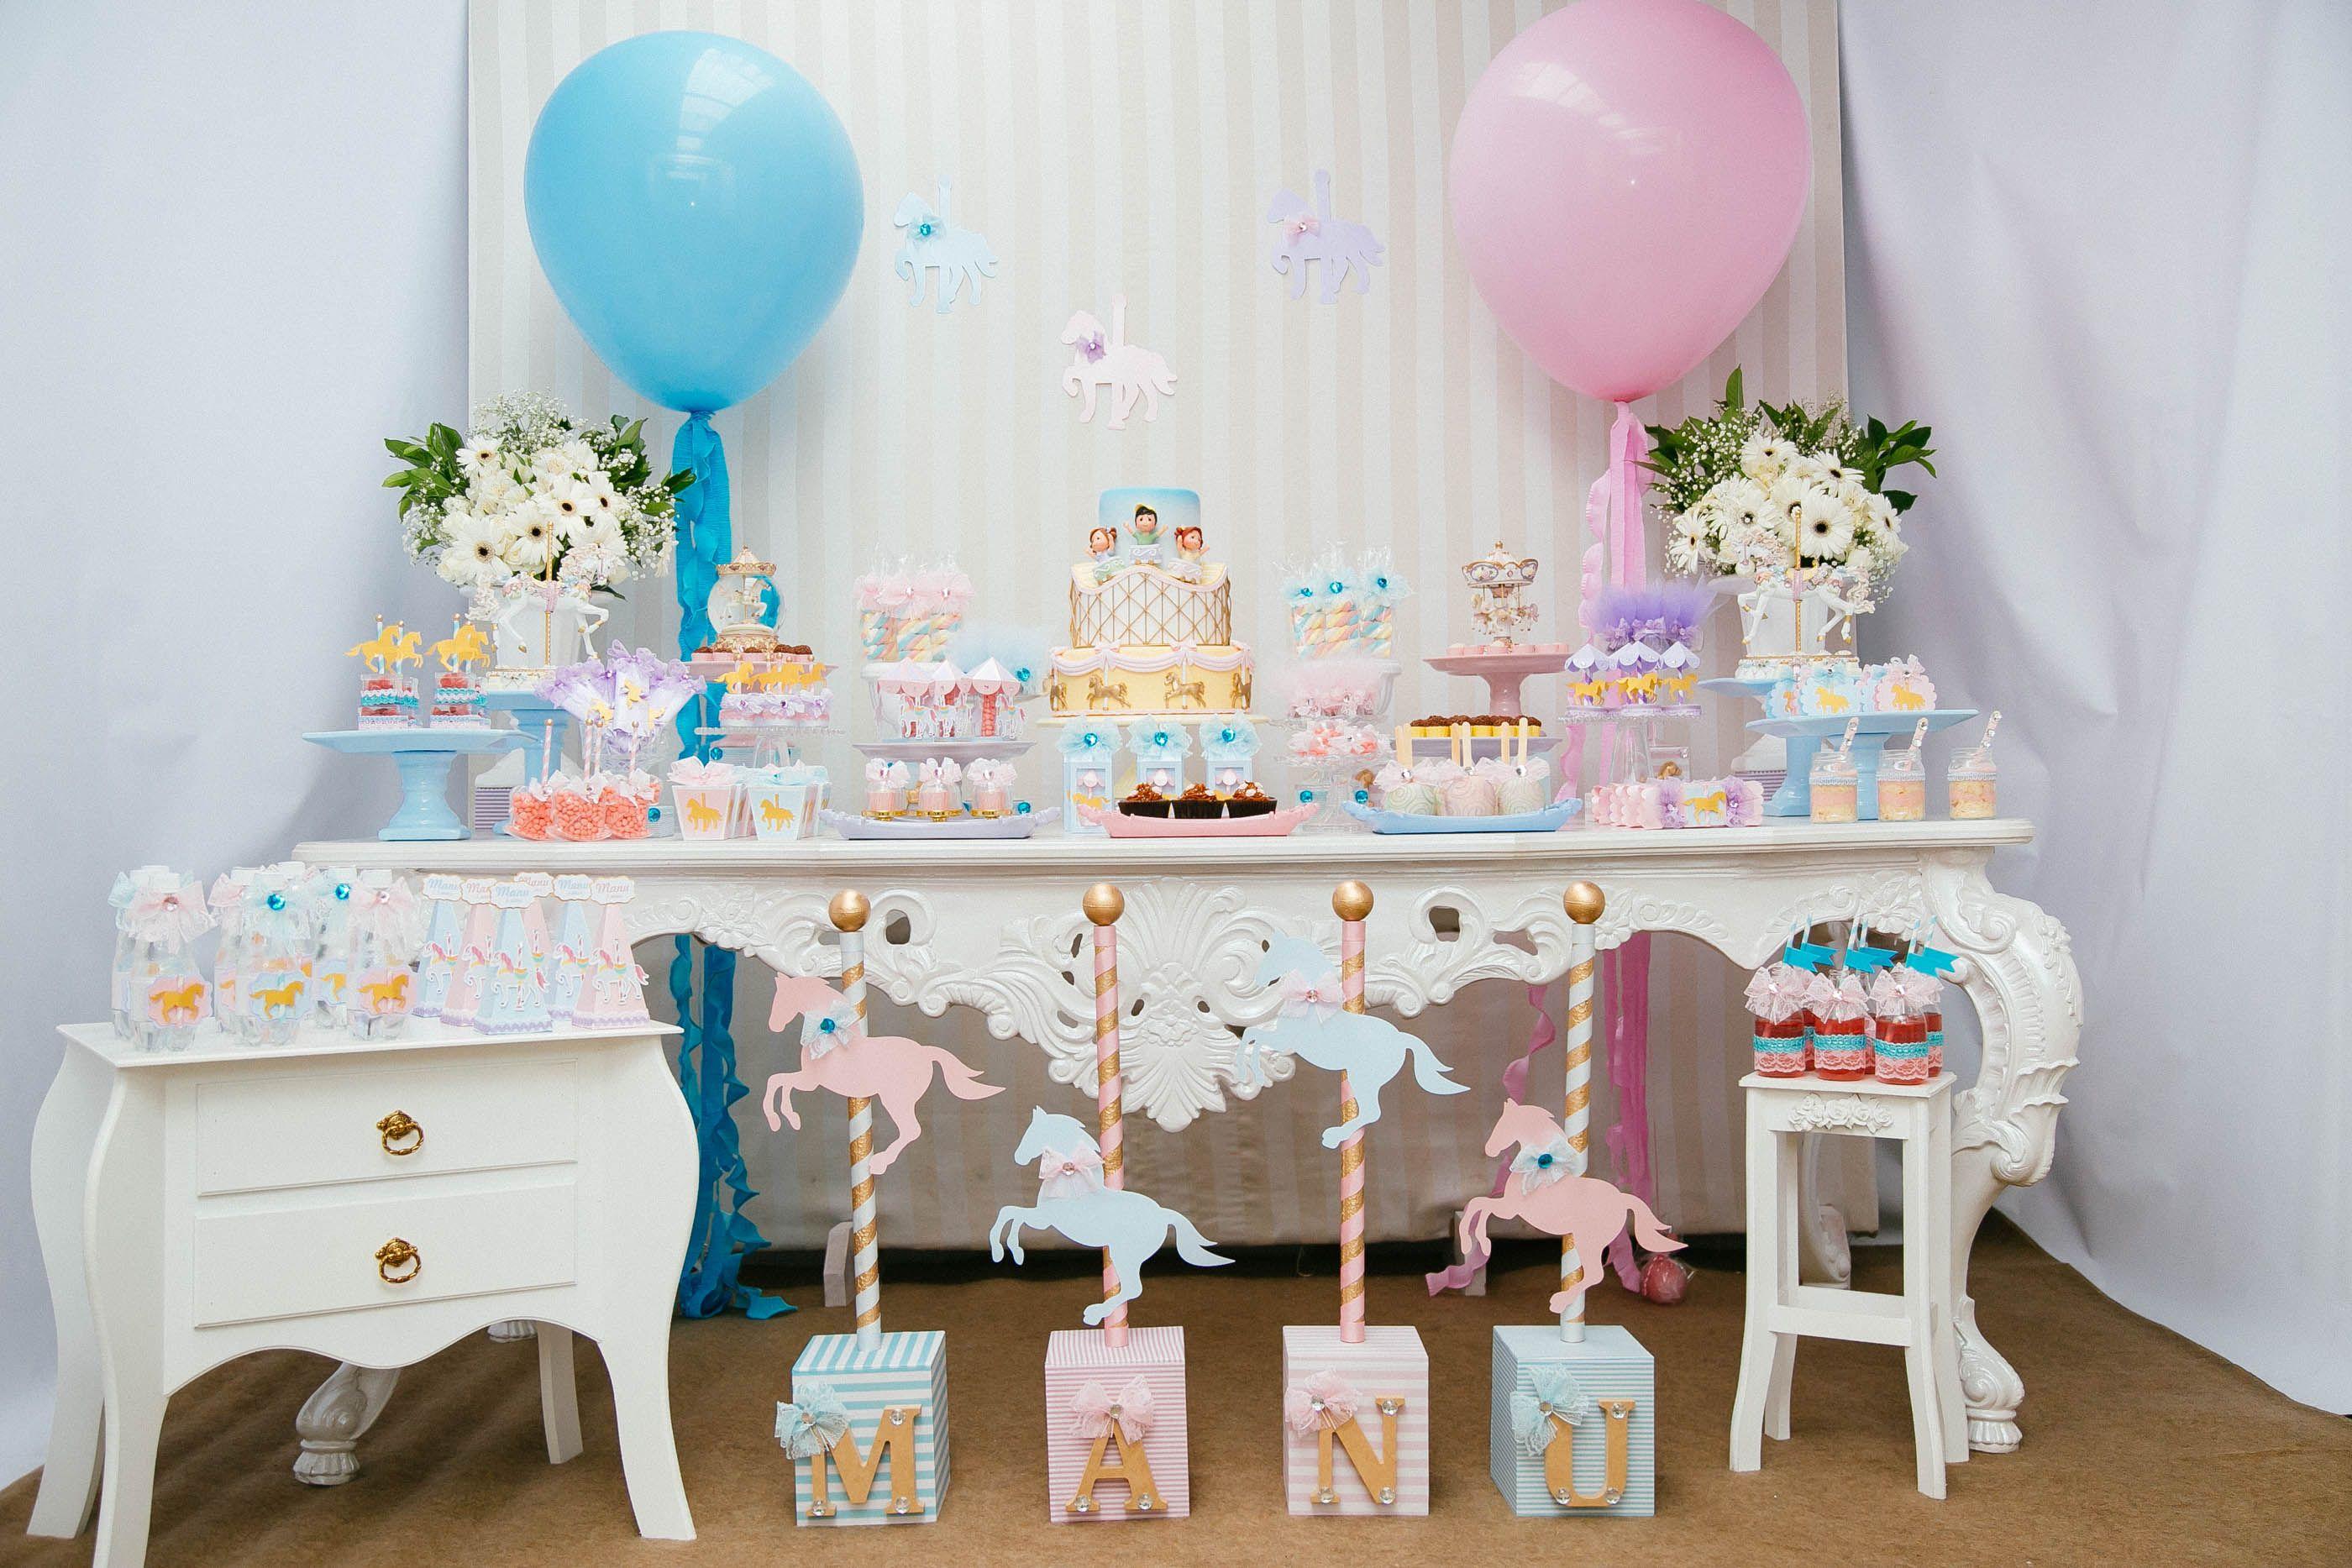 #cake #candycolors #pastelcolors #carrossel #party #kids #carousel #festa #criança #menina #decor #ideias #ideas #inspirataçao #inspiration #acervo #locacao #locacaoobjetosfesta #saopaulo